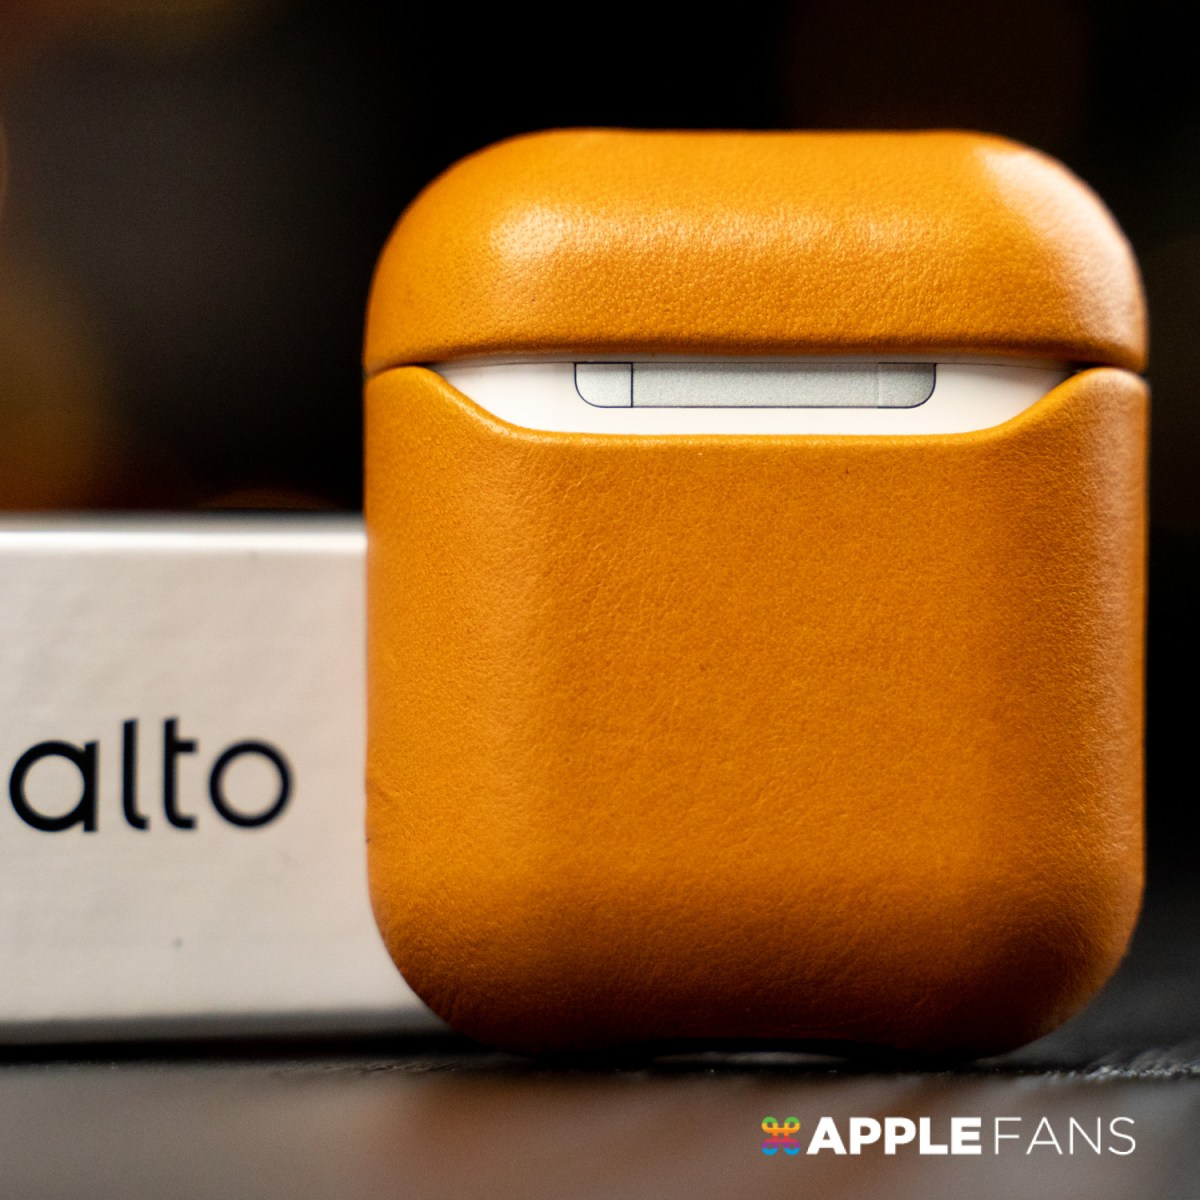 Alto AirPods 皮革保護套